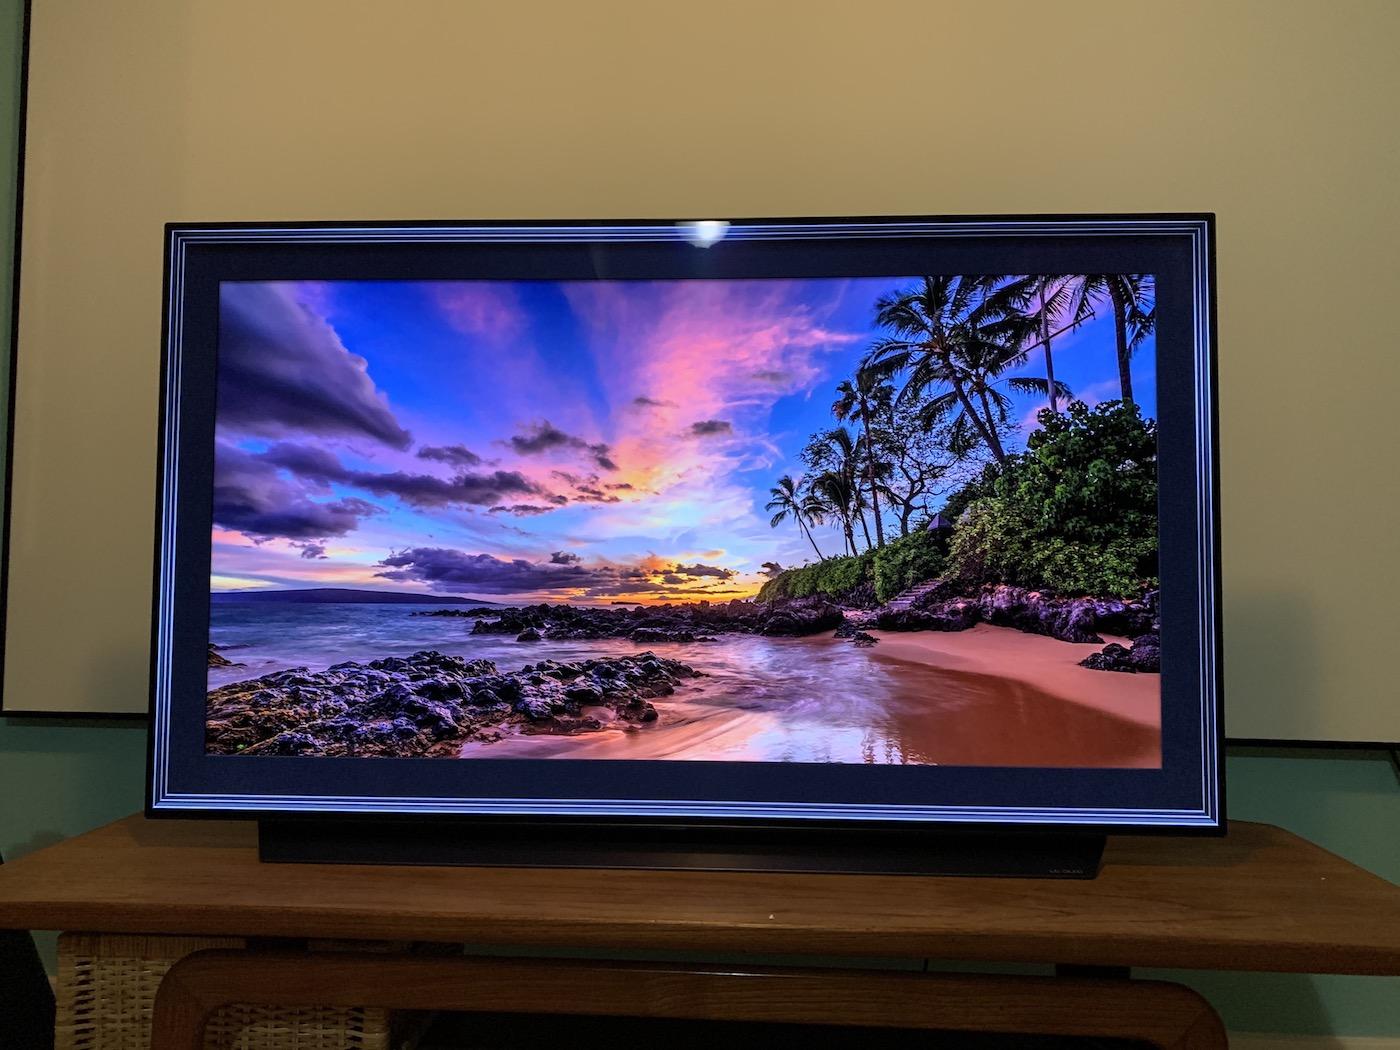 LG C9 OLED 4K TV Ambient Mode